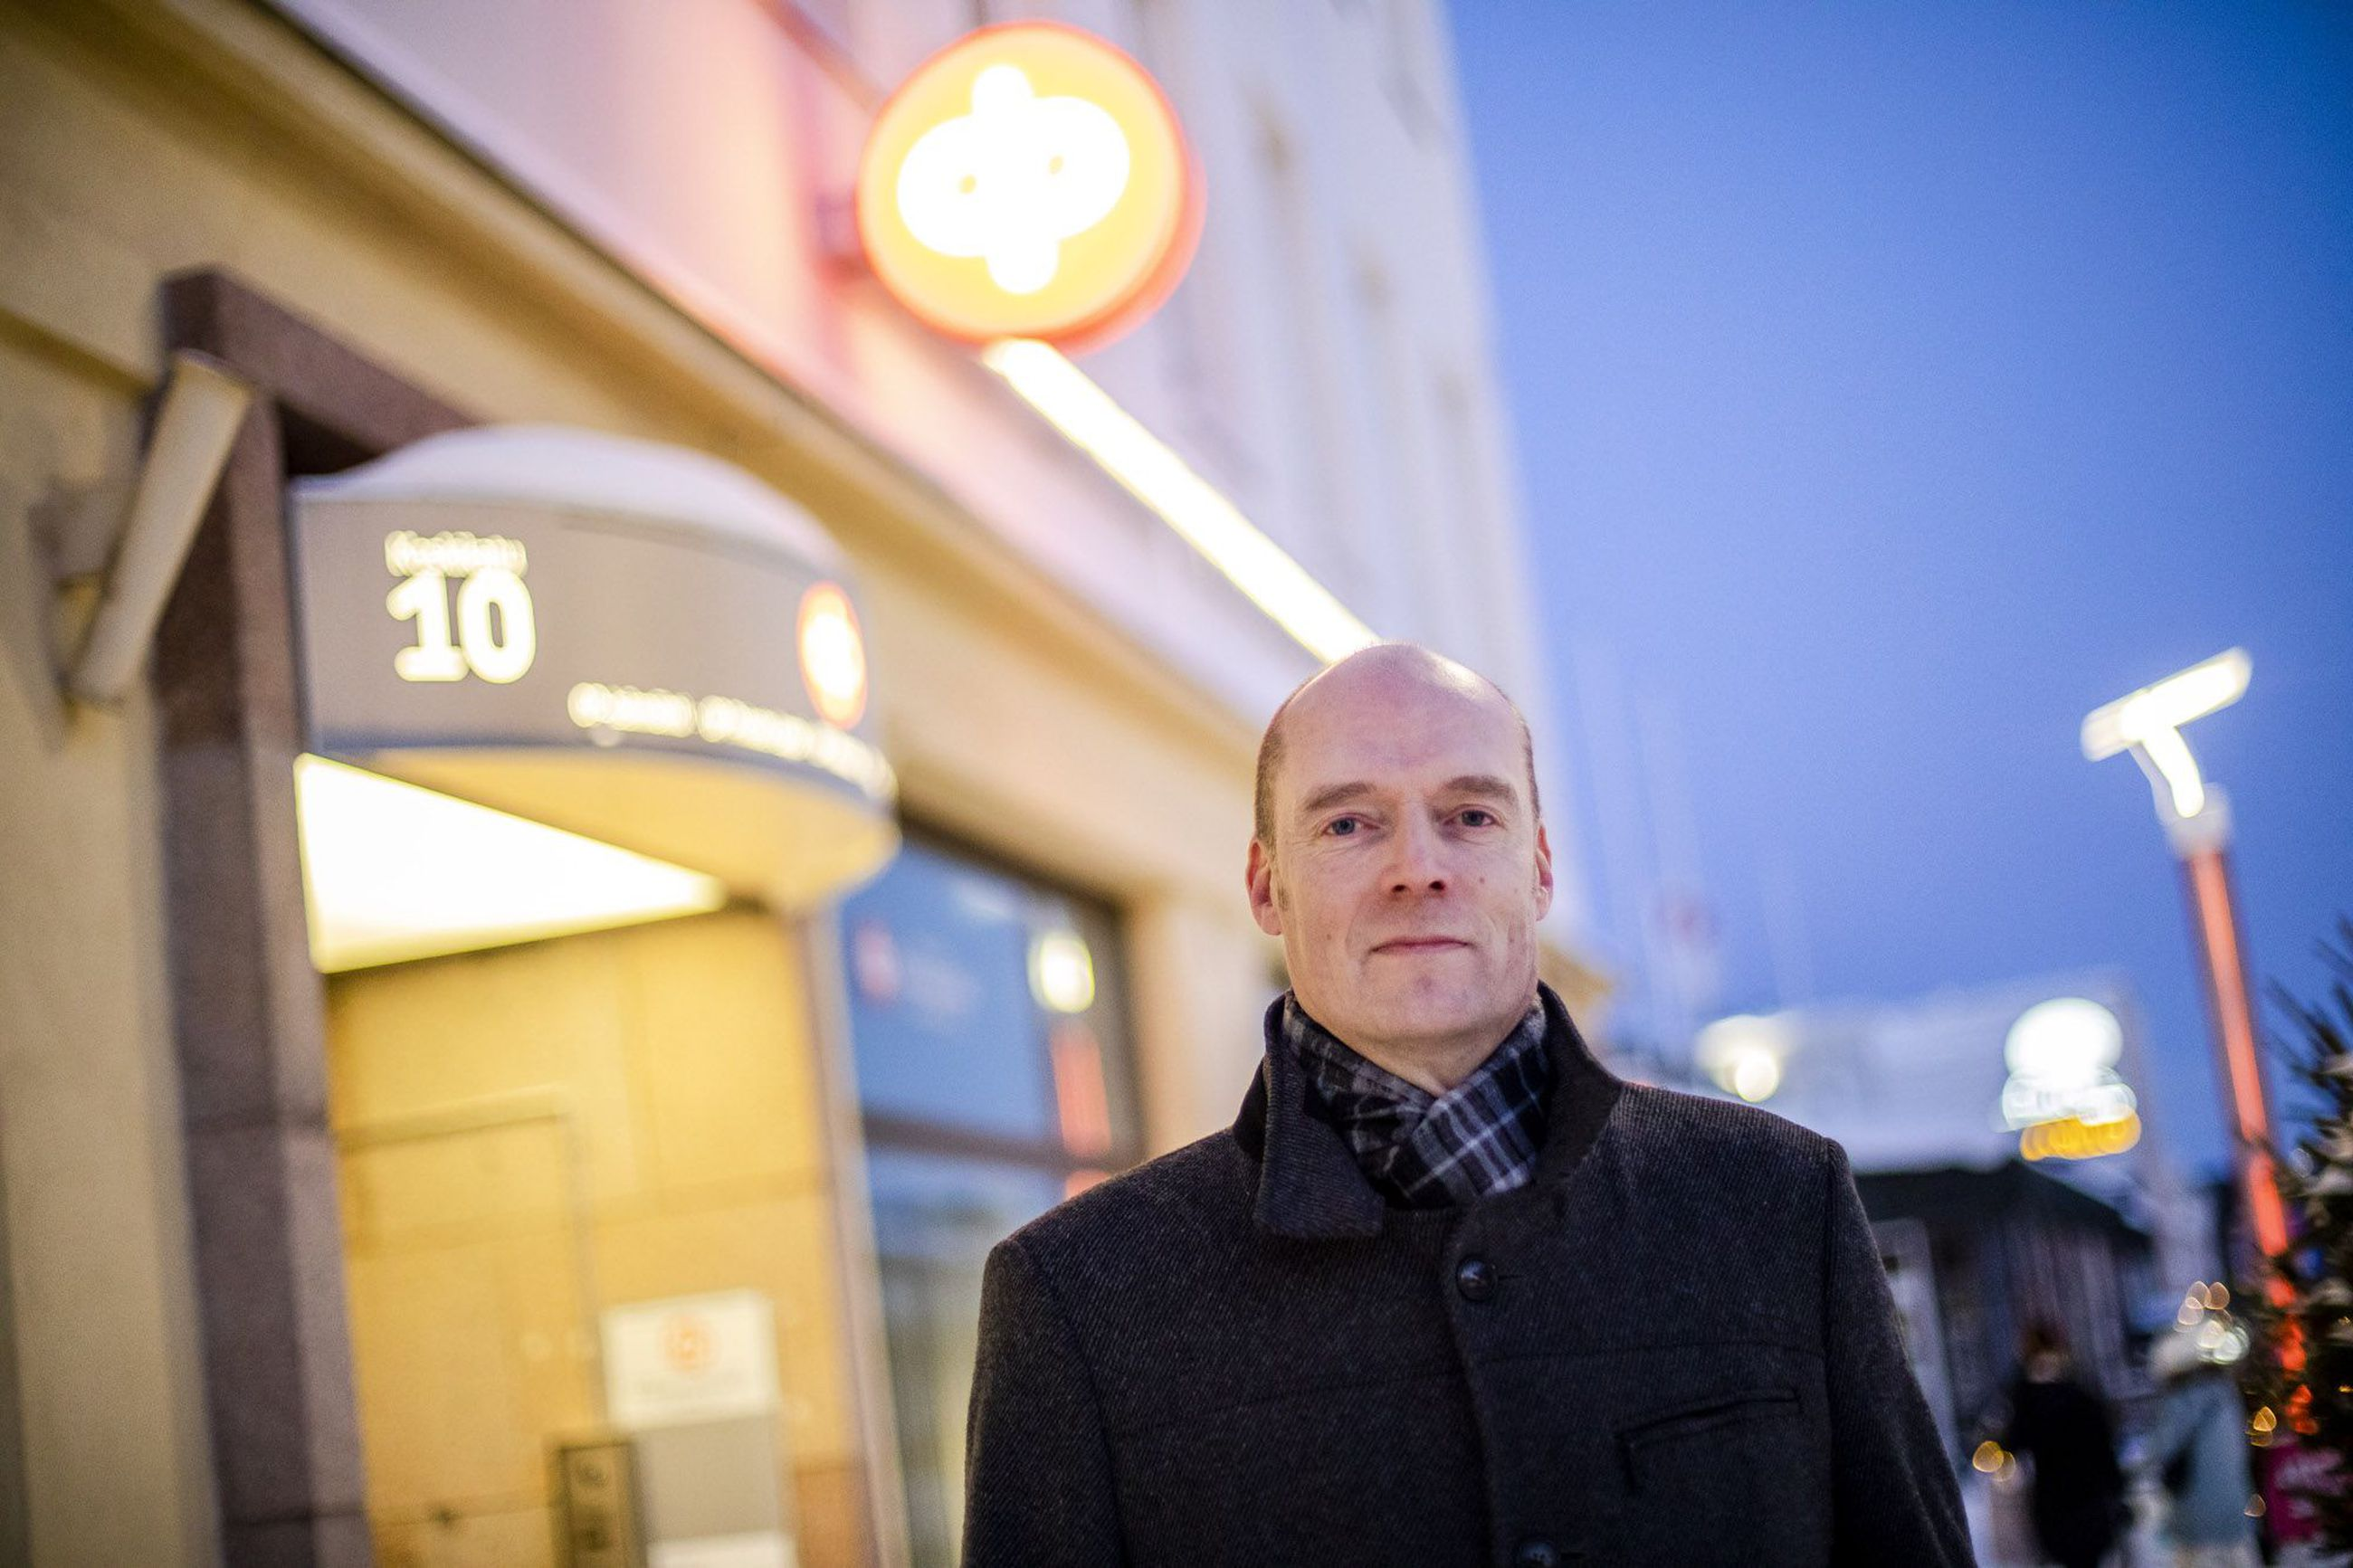 Osuuspankki Rovaniemi